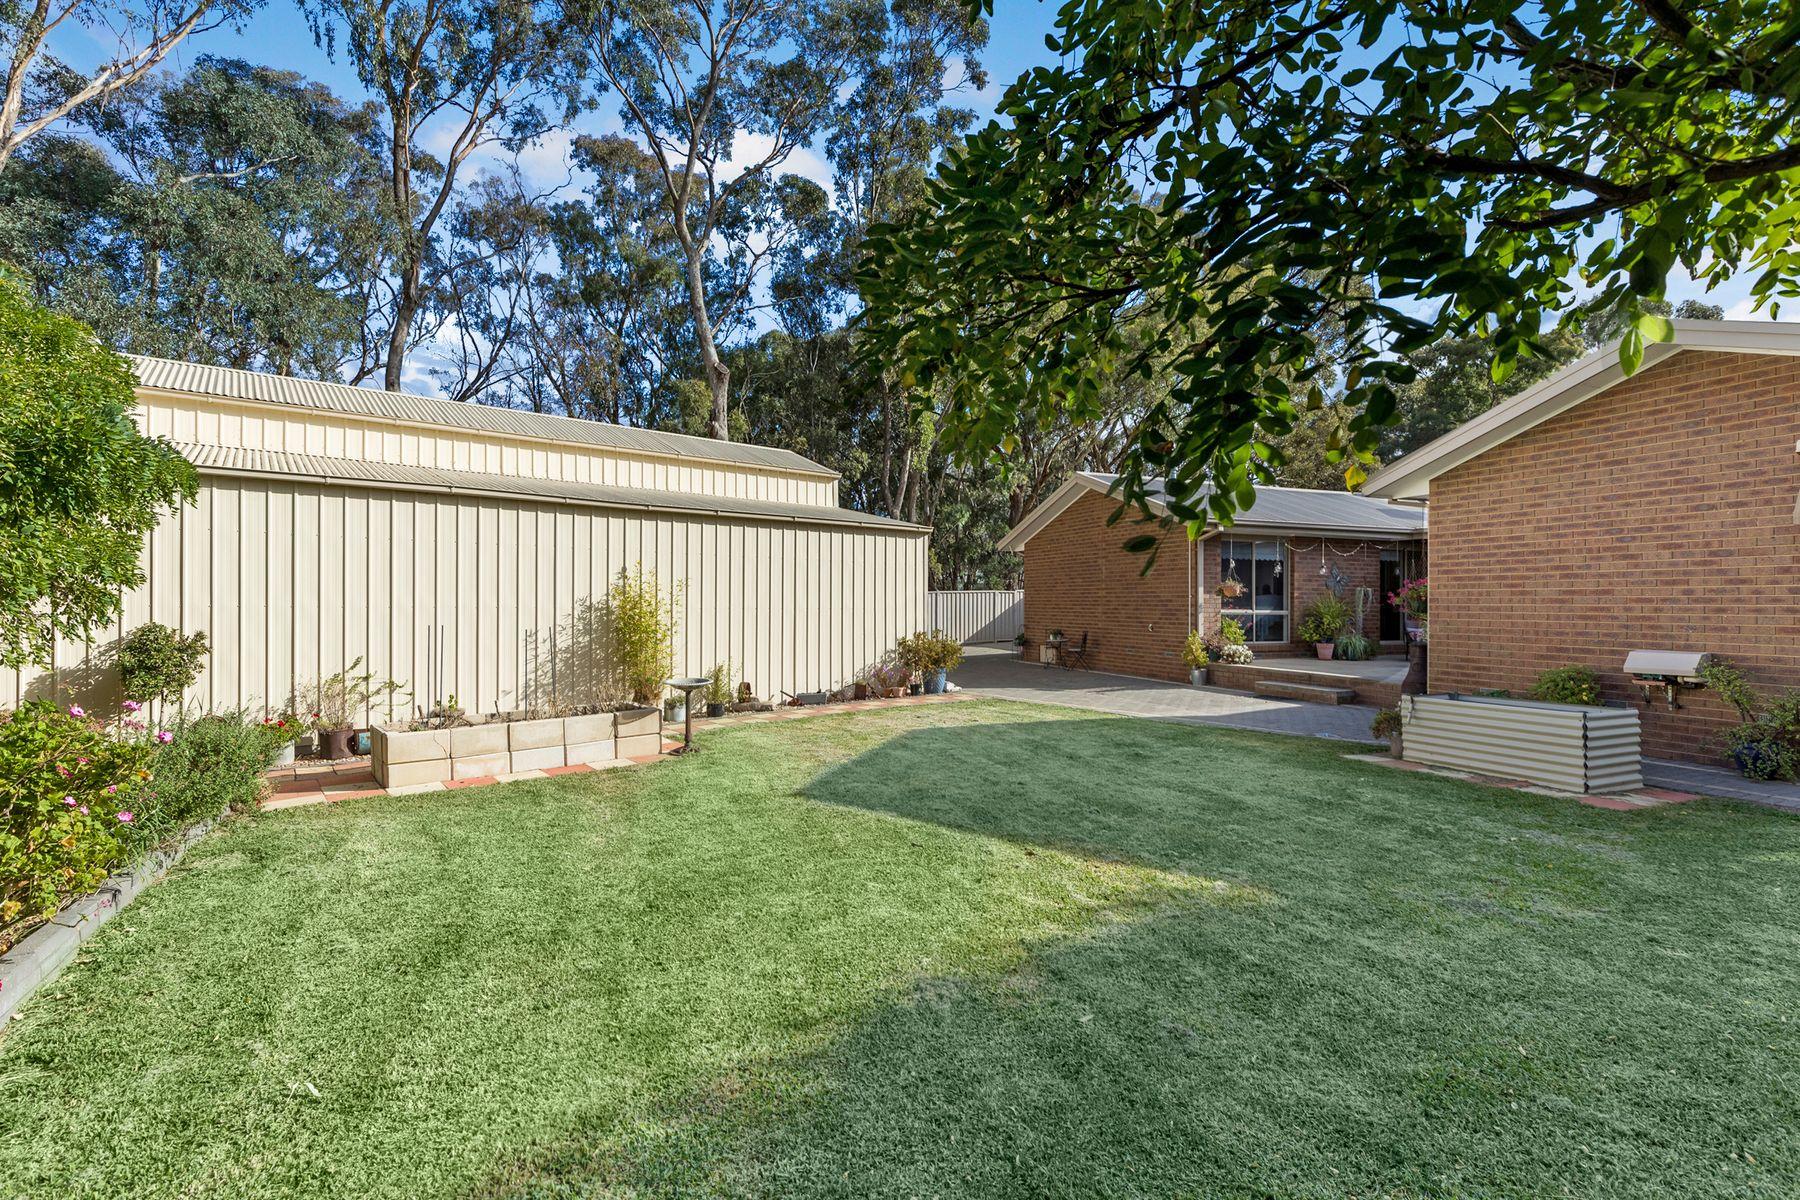 14-36  Fairview Road, Kangaroo Flat, VIC 3555